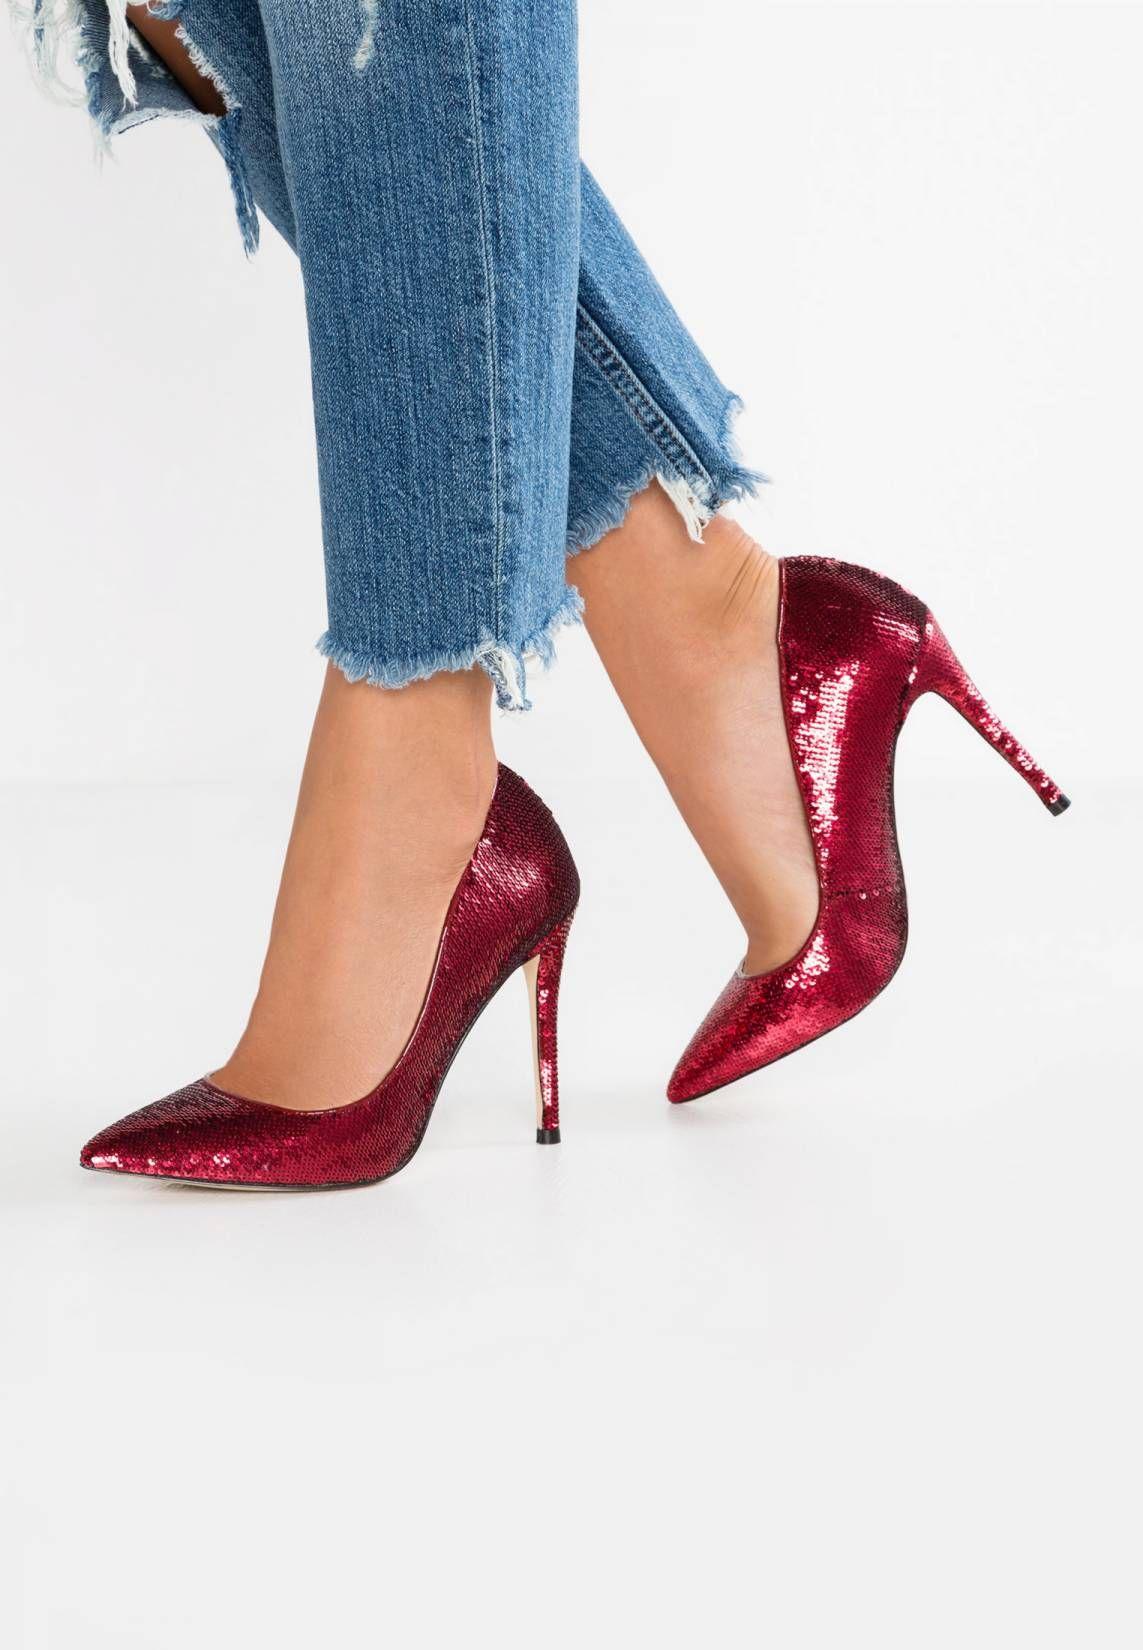 754f880dd5ca24 STESSY - High Heel Pumps - red miscellaneous. Sohle Kunststoff.  Decksohle Leder. Innenmaterial Lederimitat Textil. Details Pailletten.  Obermaterial Textil.